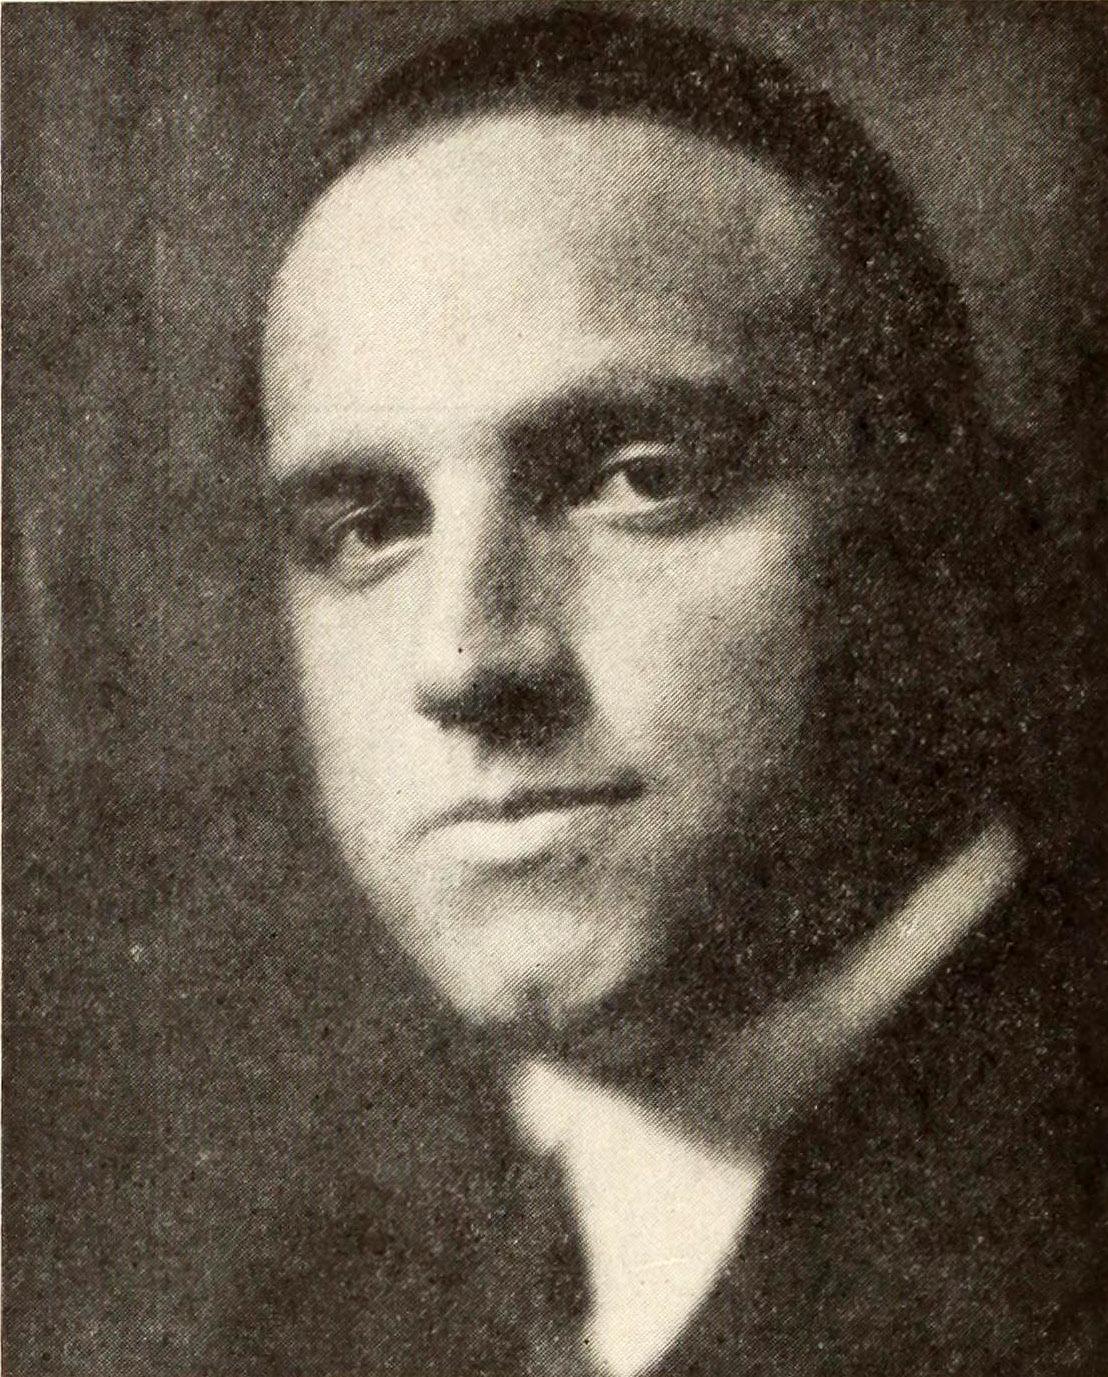 Allan Dwan – Wikipédia, a enciclopédia livre